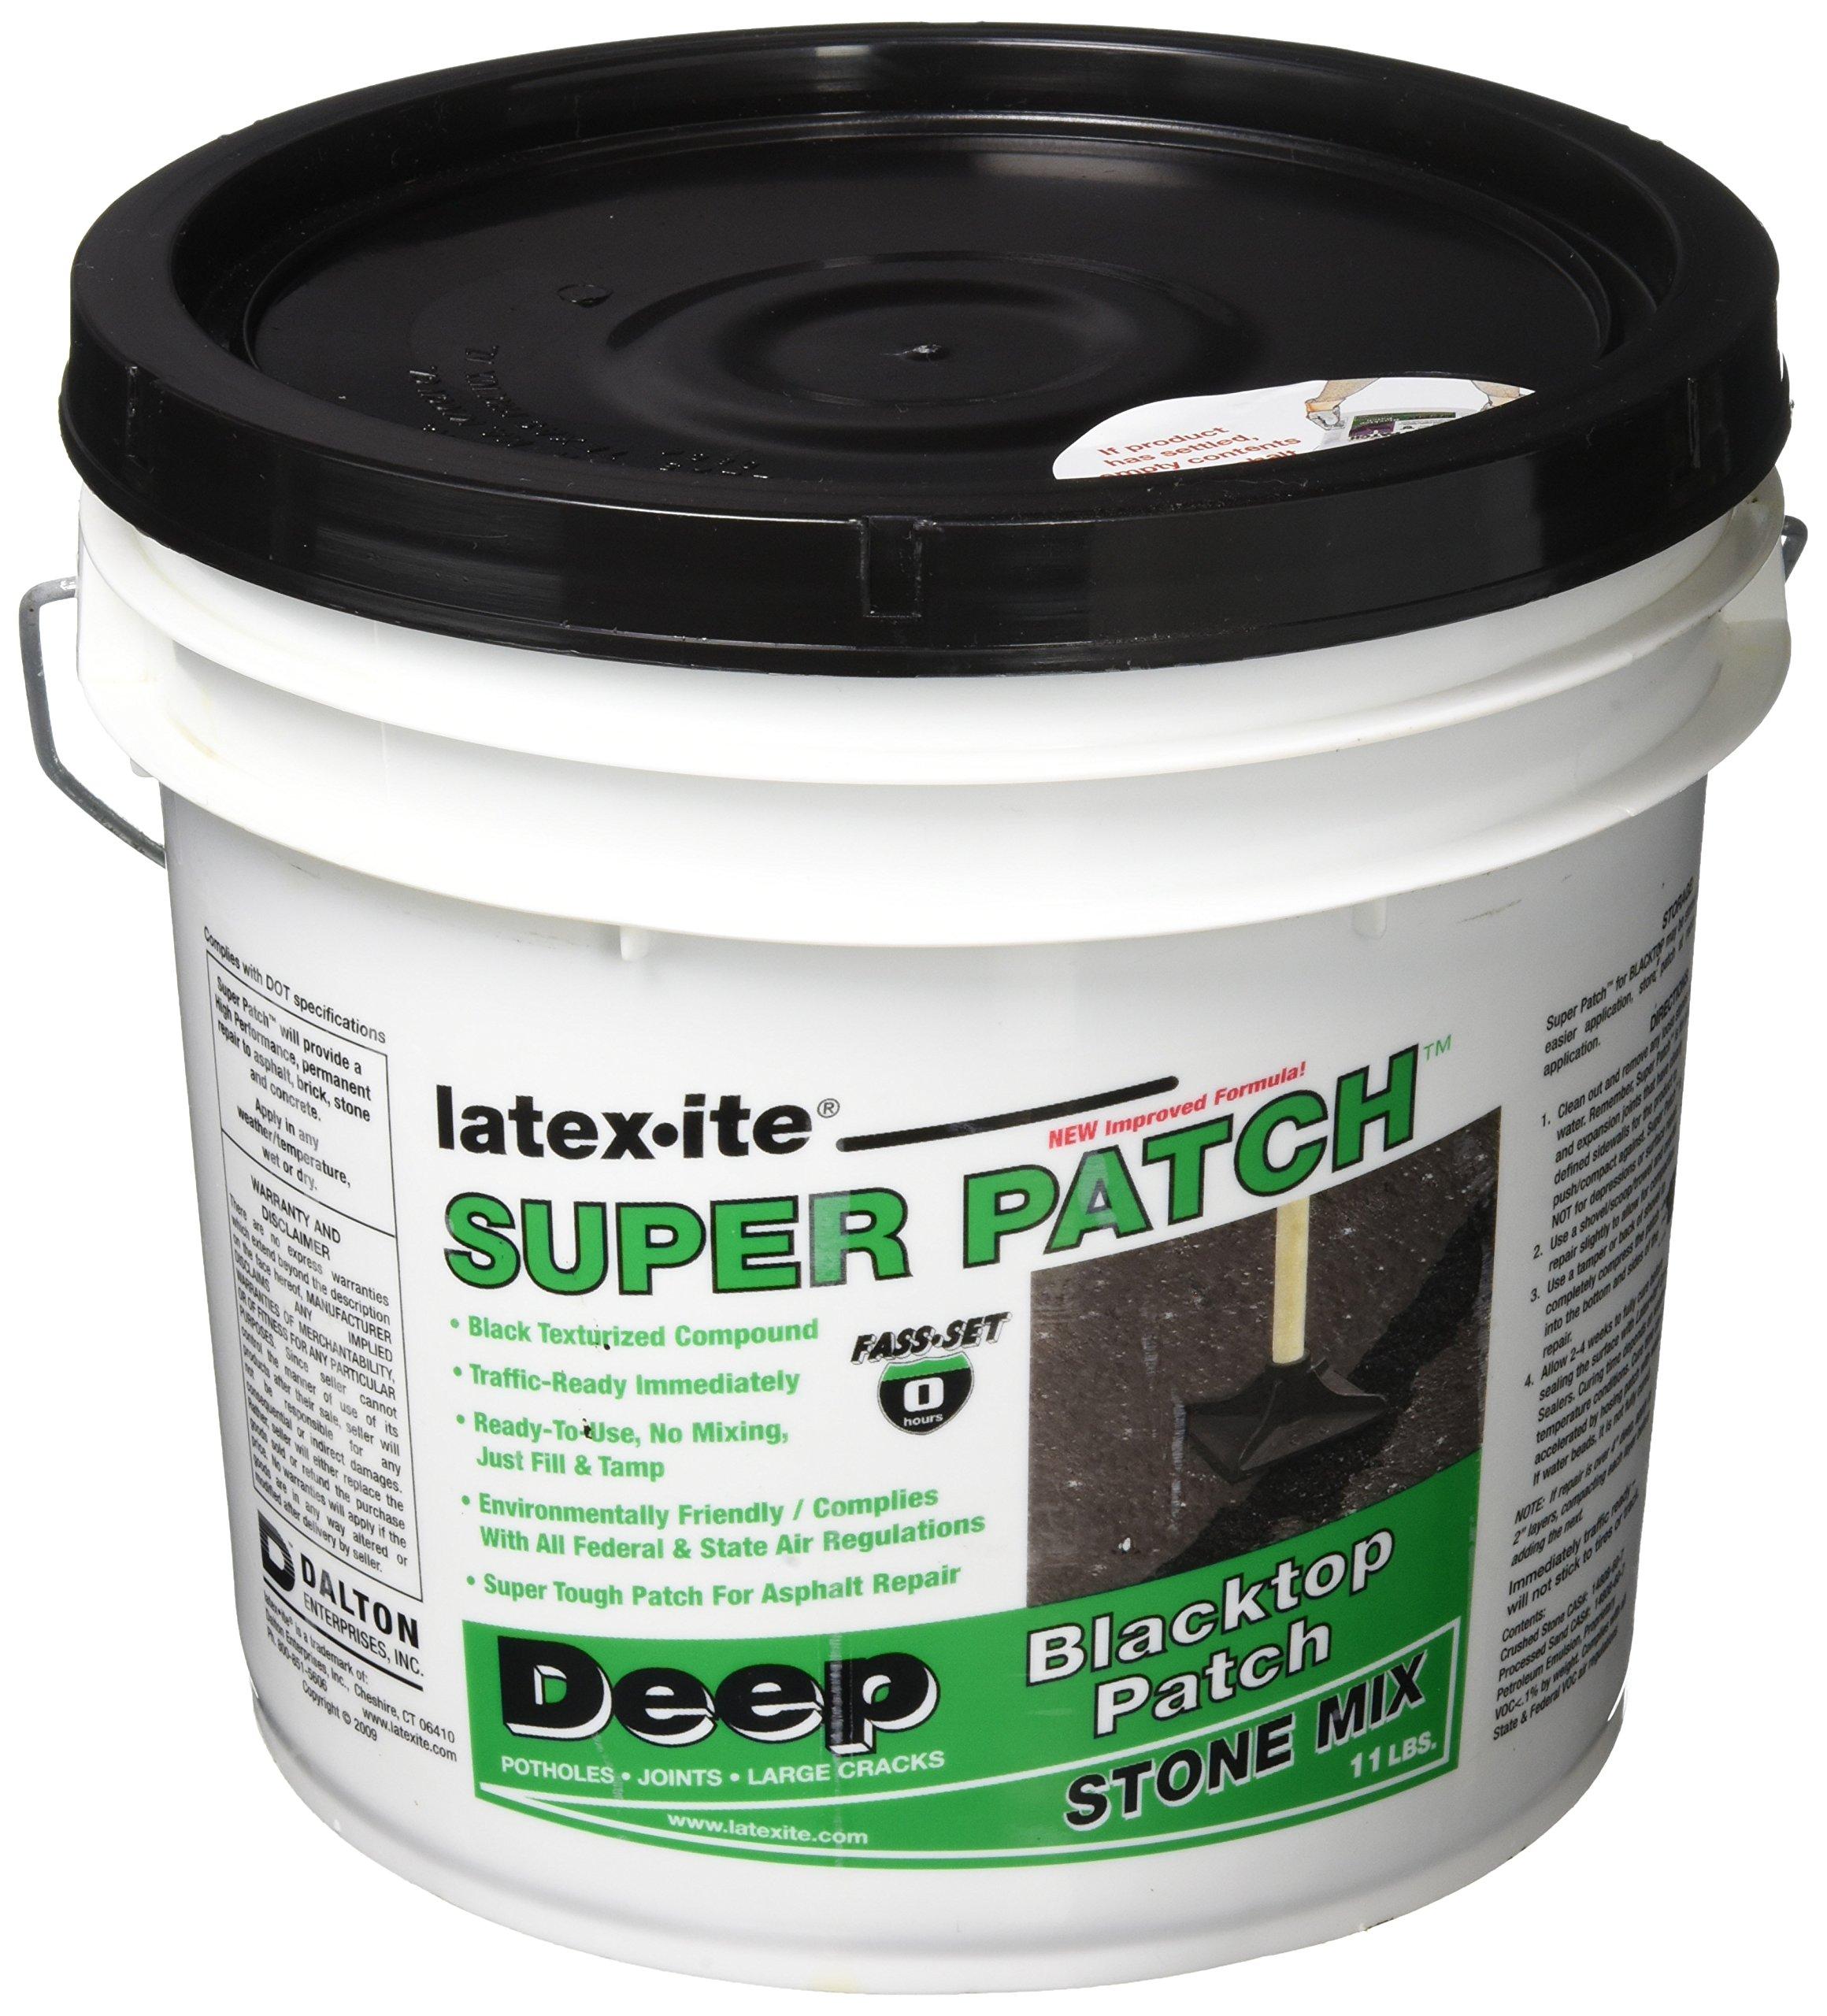 DALTON ENTERPRISES 31916 Super Deep Pavement Patch Stone Mix, 1 Gal